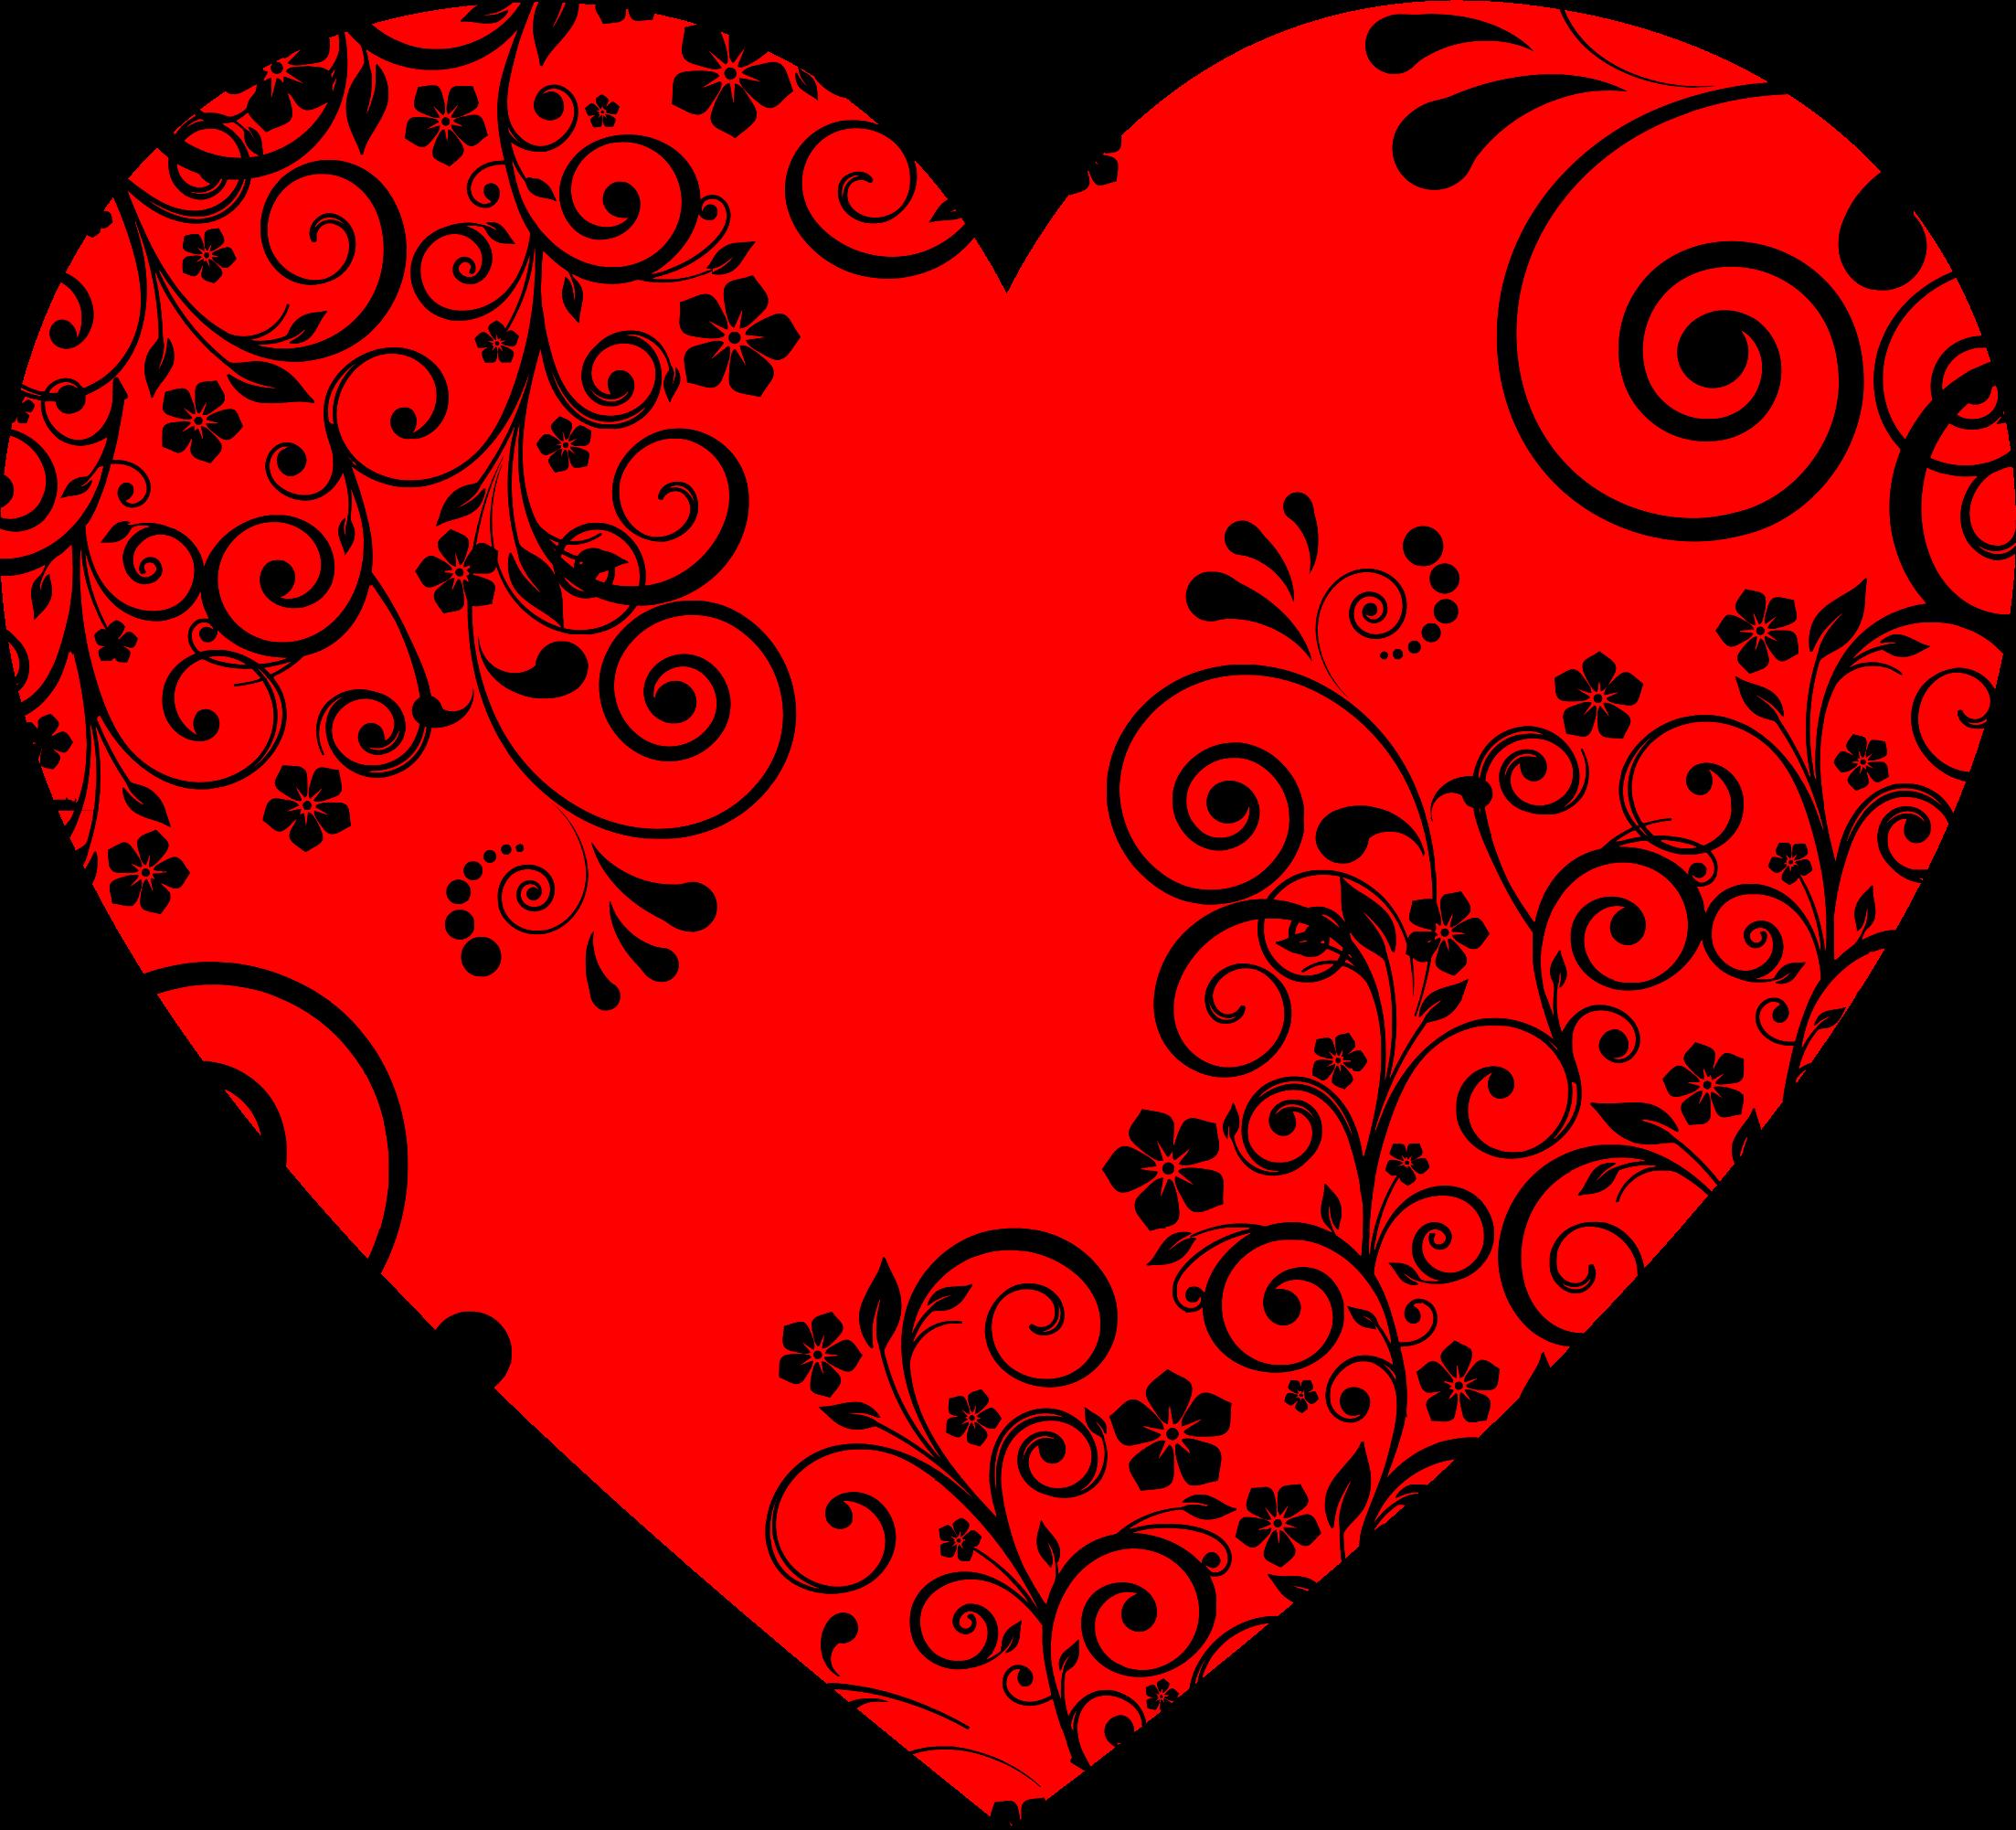 Heart flourish clipart svg transparent Clipart - Floral Flourish Heart svg transparent